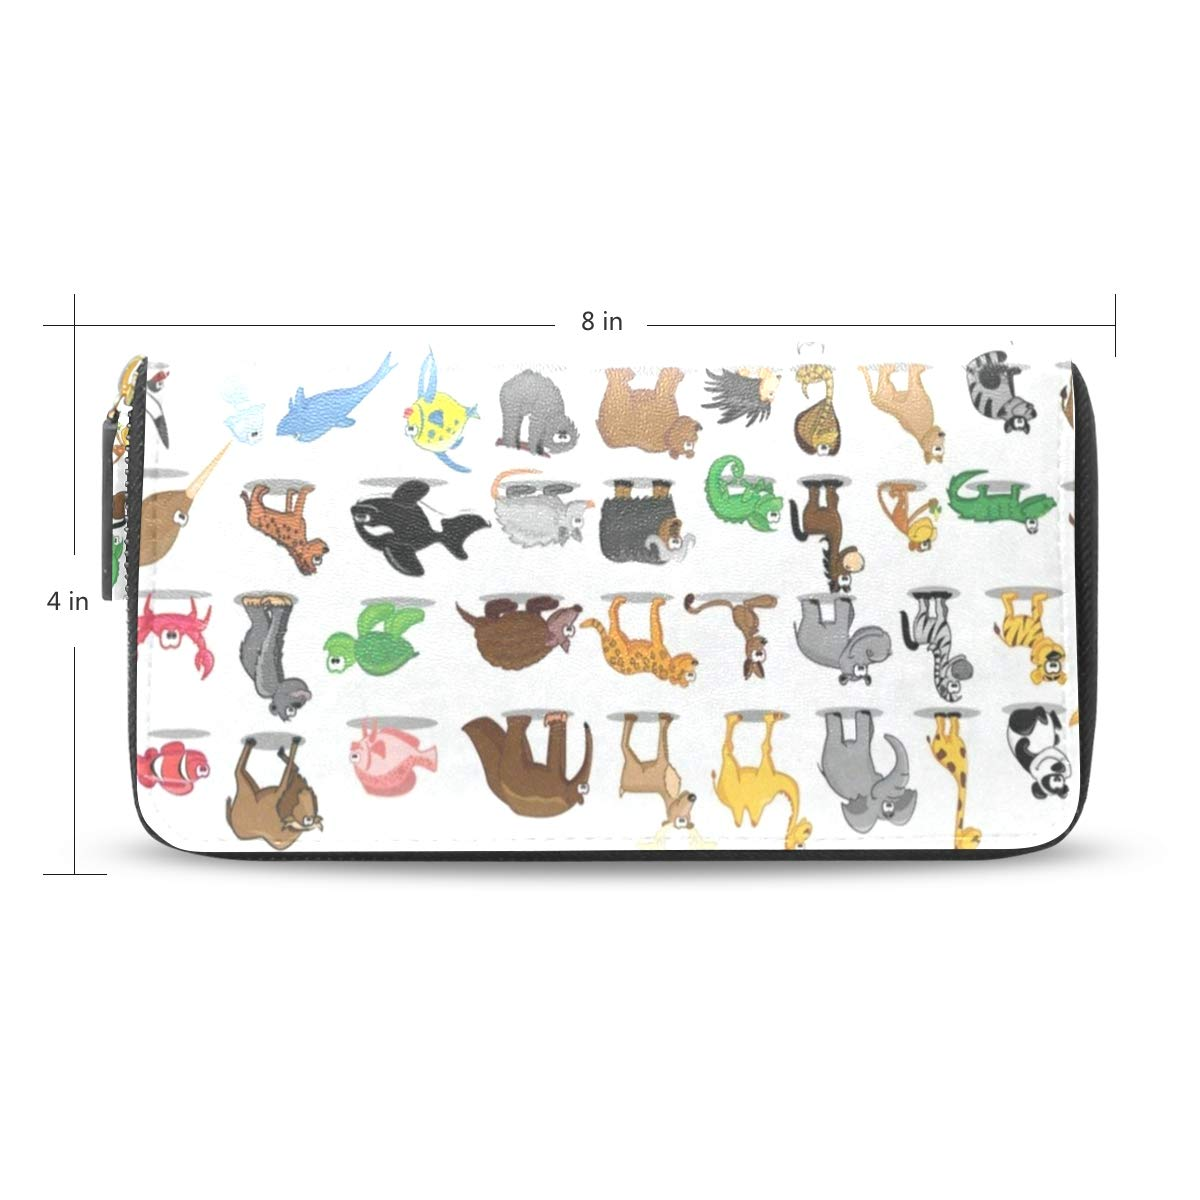 Womens Wallets Cute Kids Animal World Maps Leather Passport Wallet Change Purse Zip Handbags